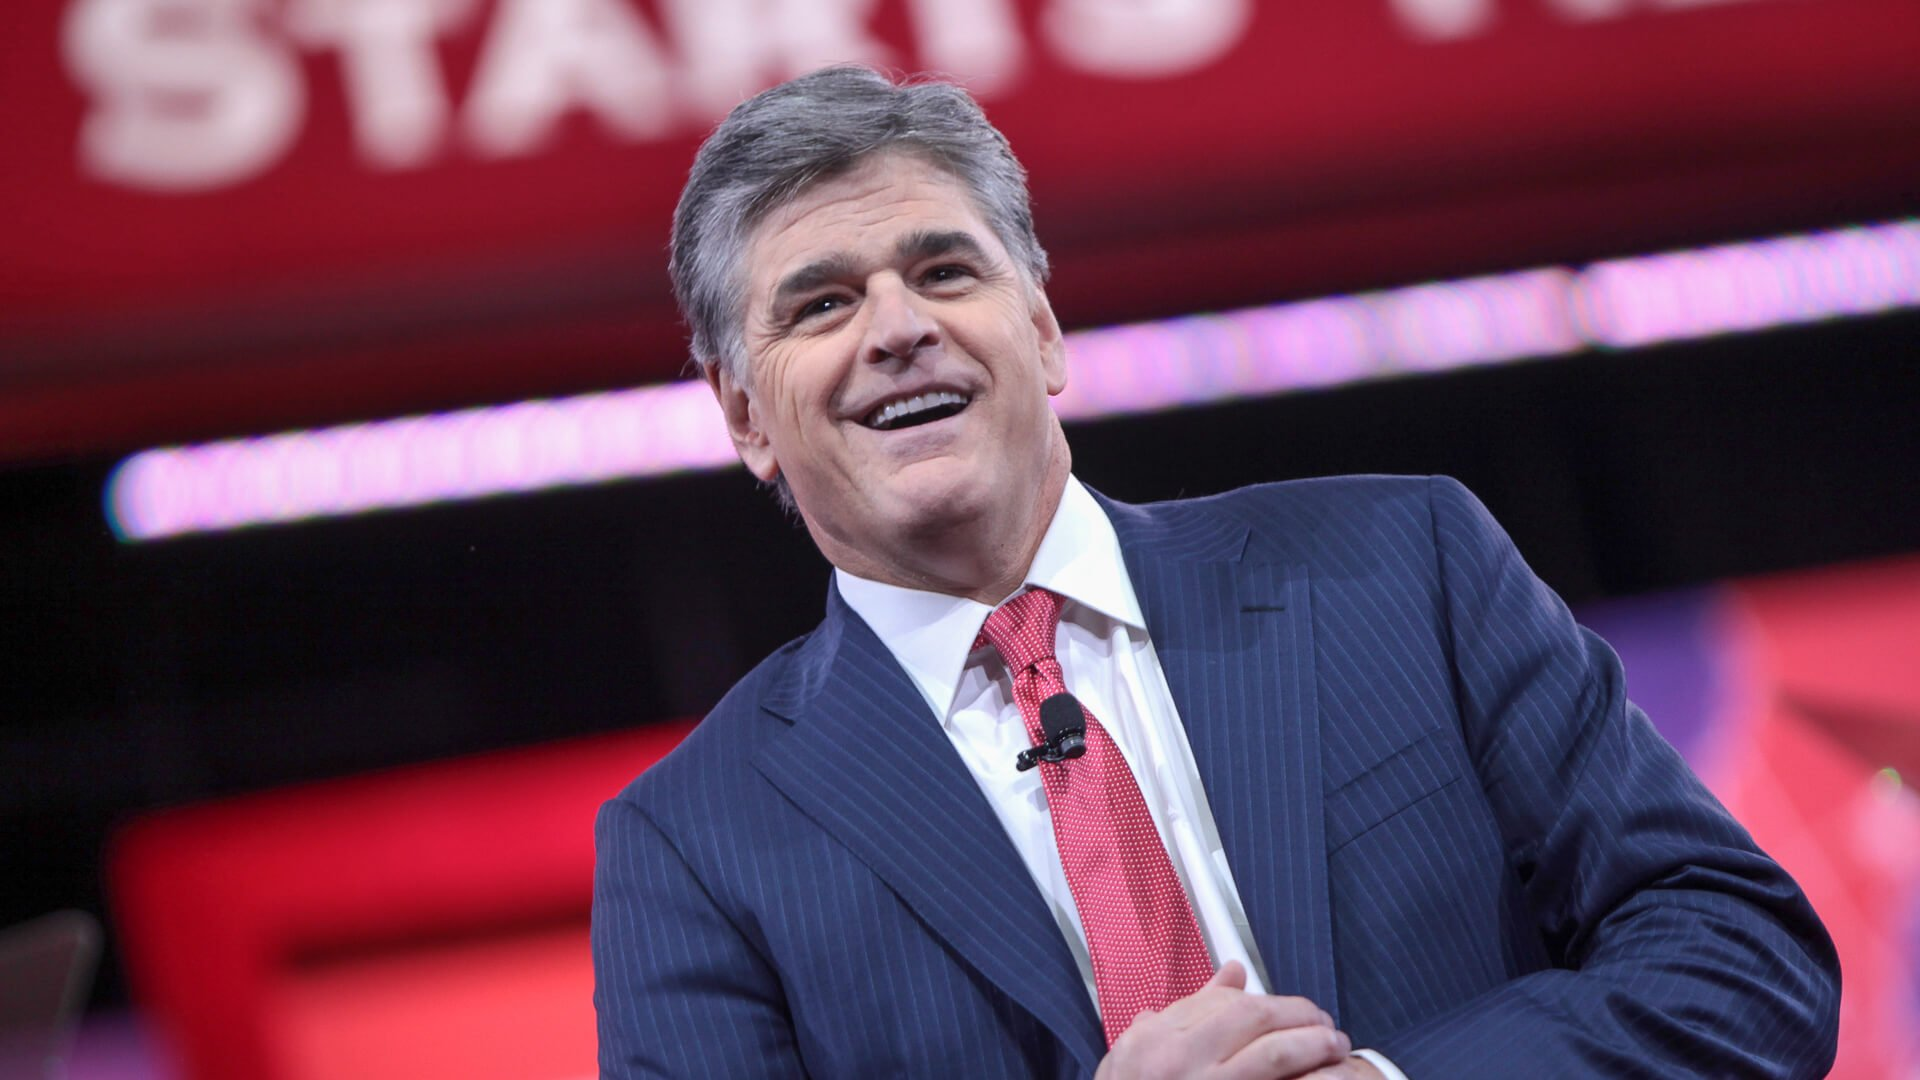 How Rich Is Fox News' Sean Hannity?